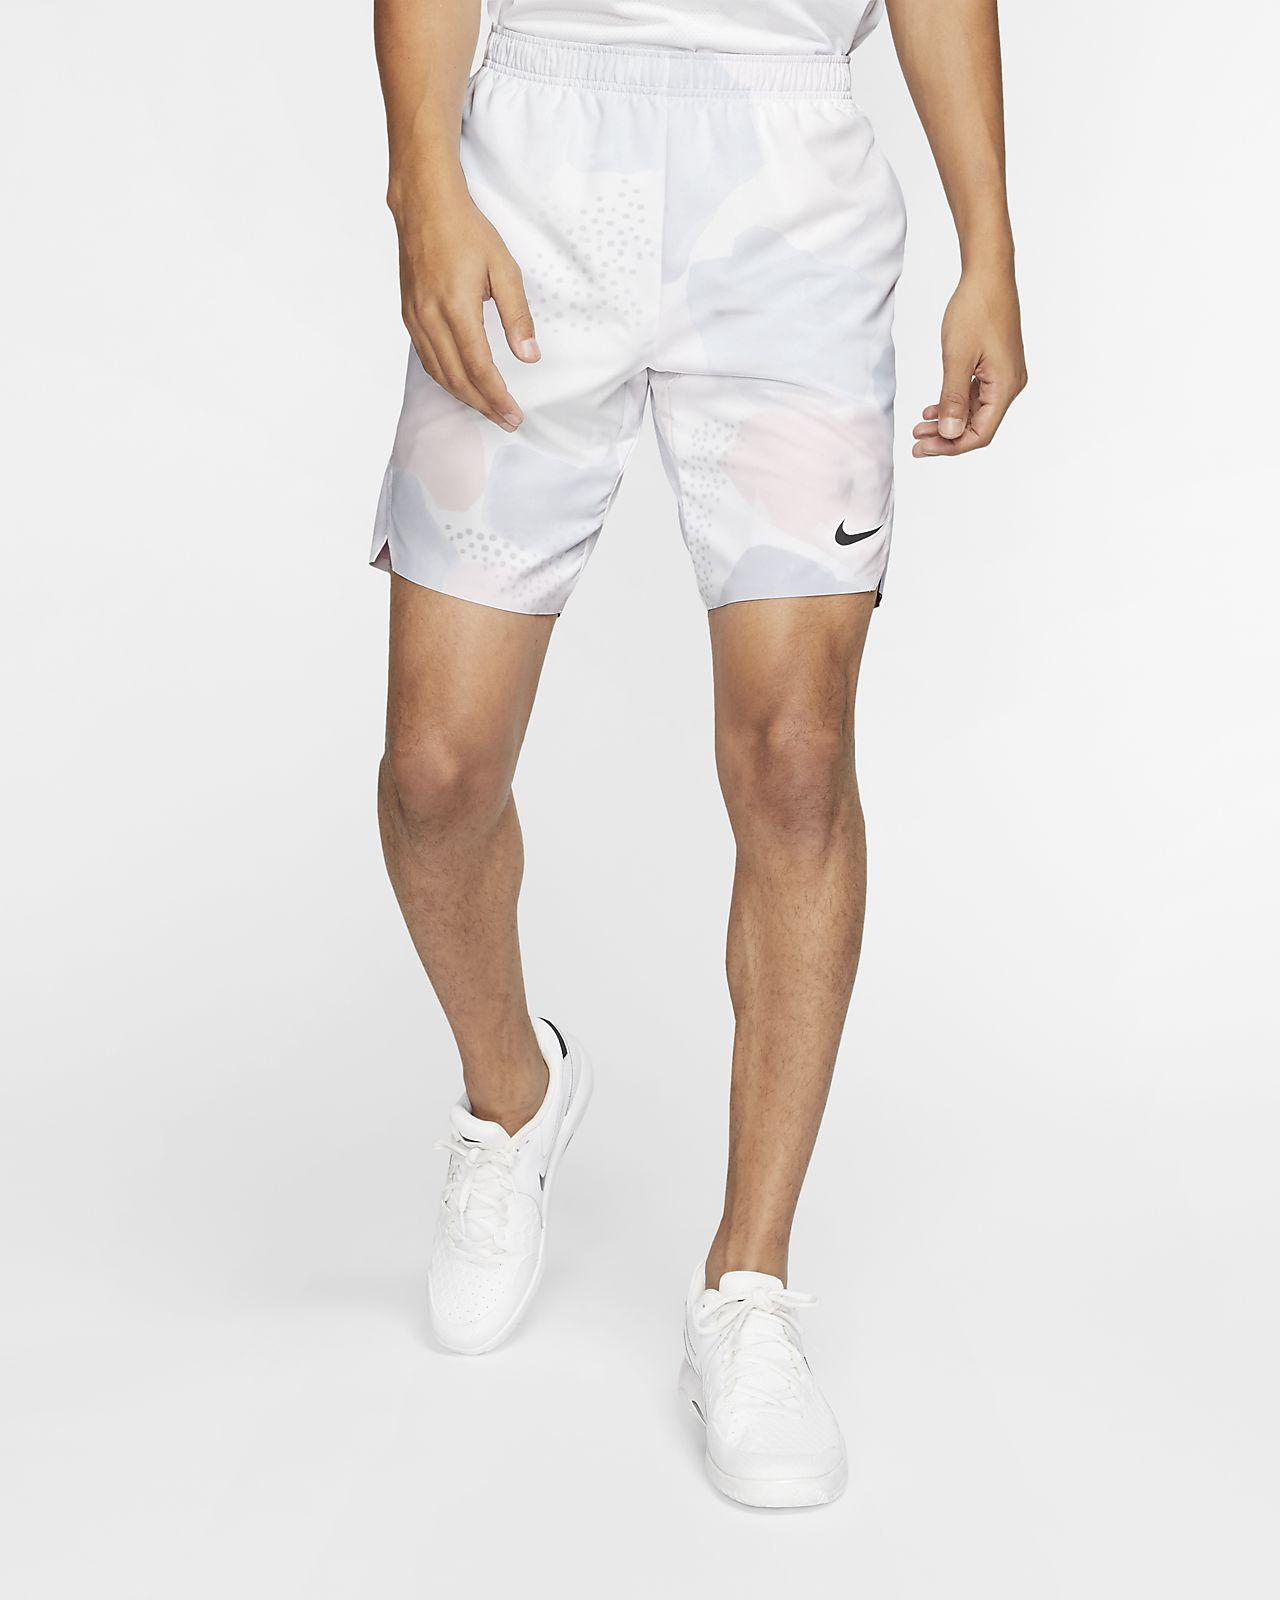 Pánské tenisové kraťasy s potiskem NikeCourt Flex Ace